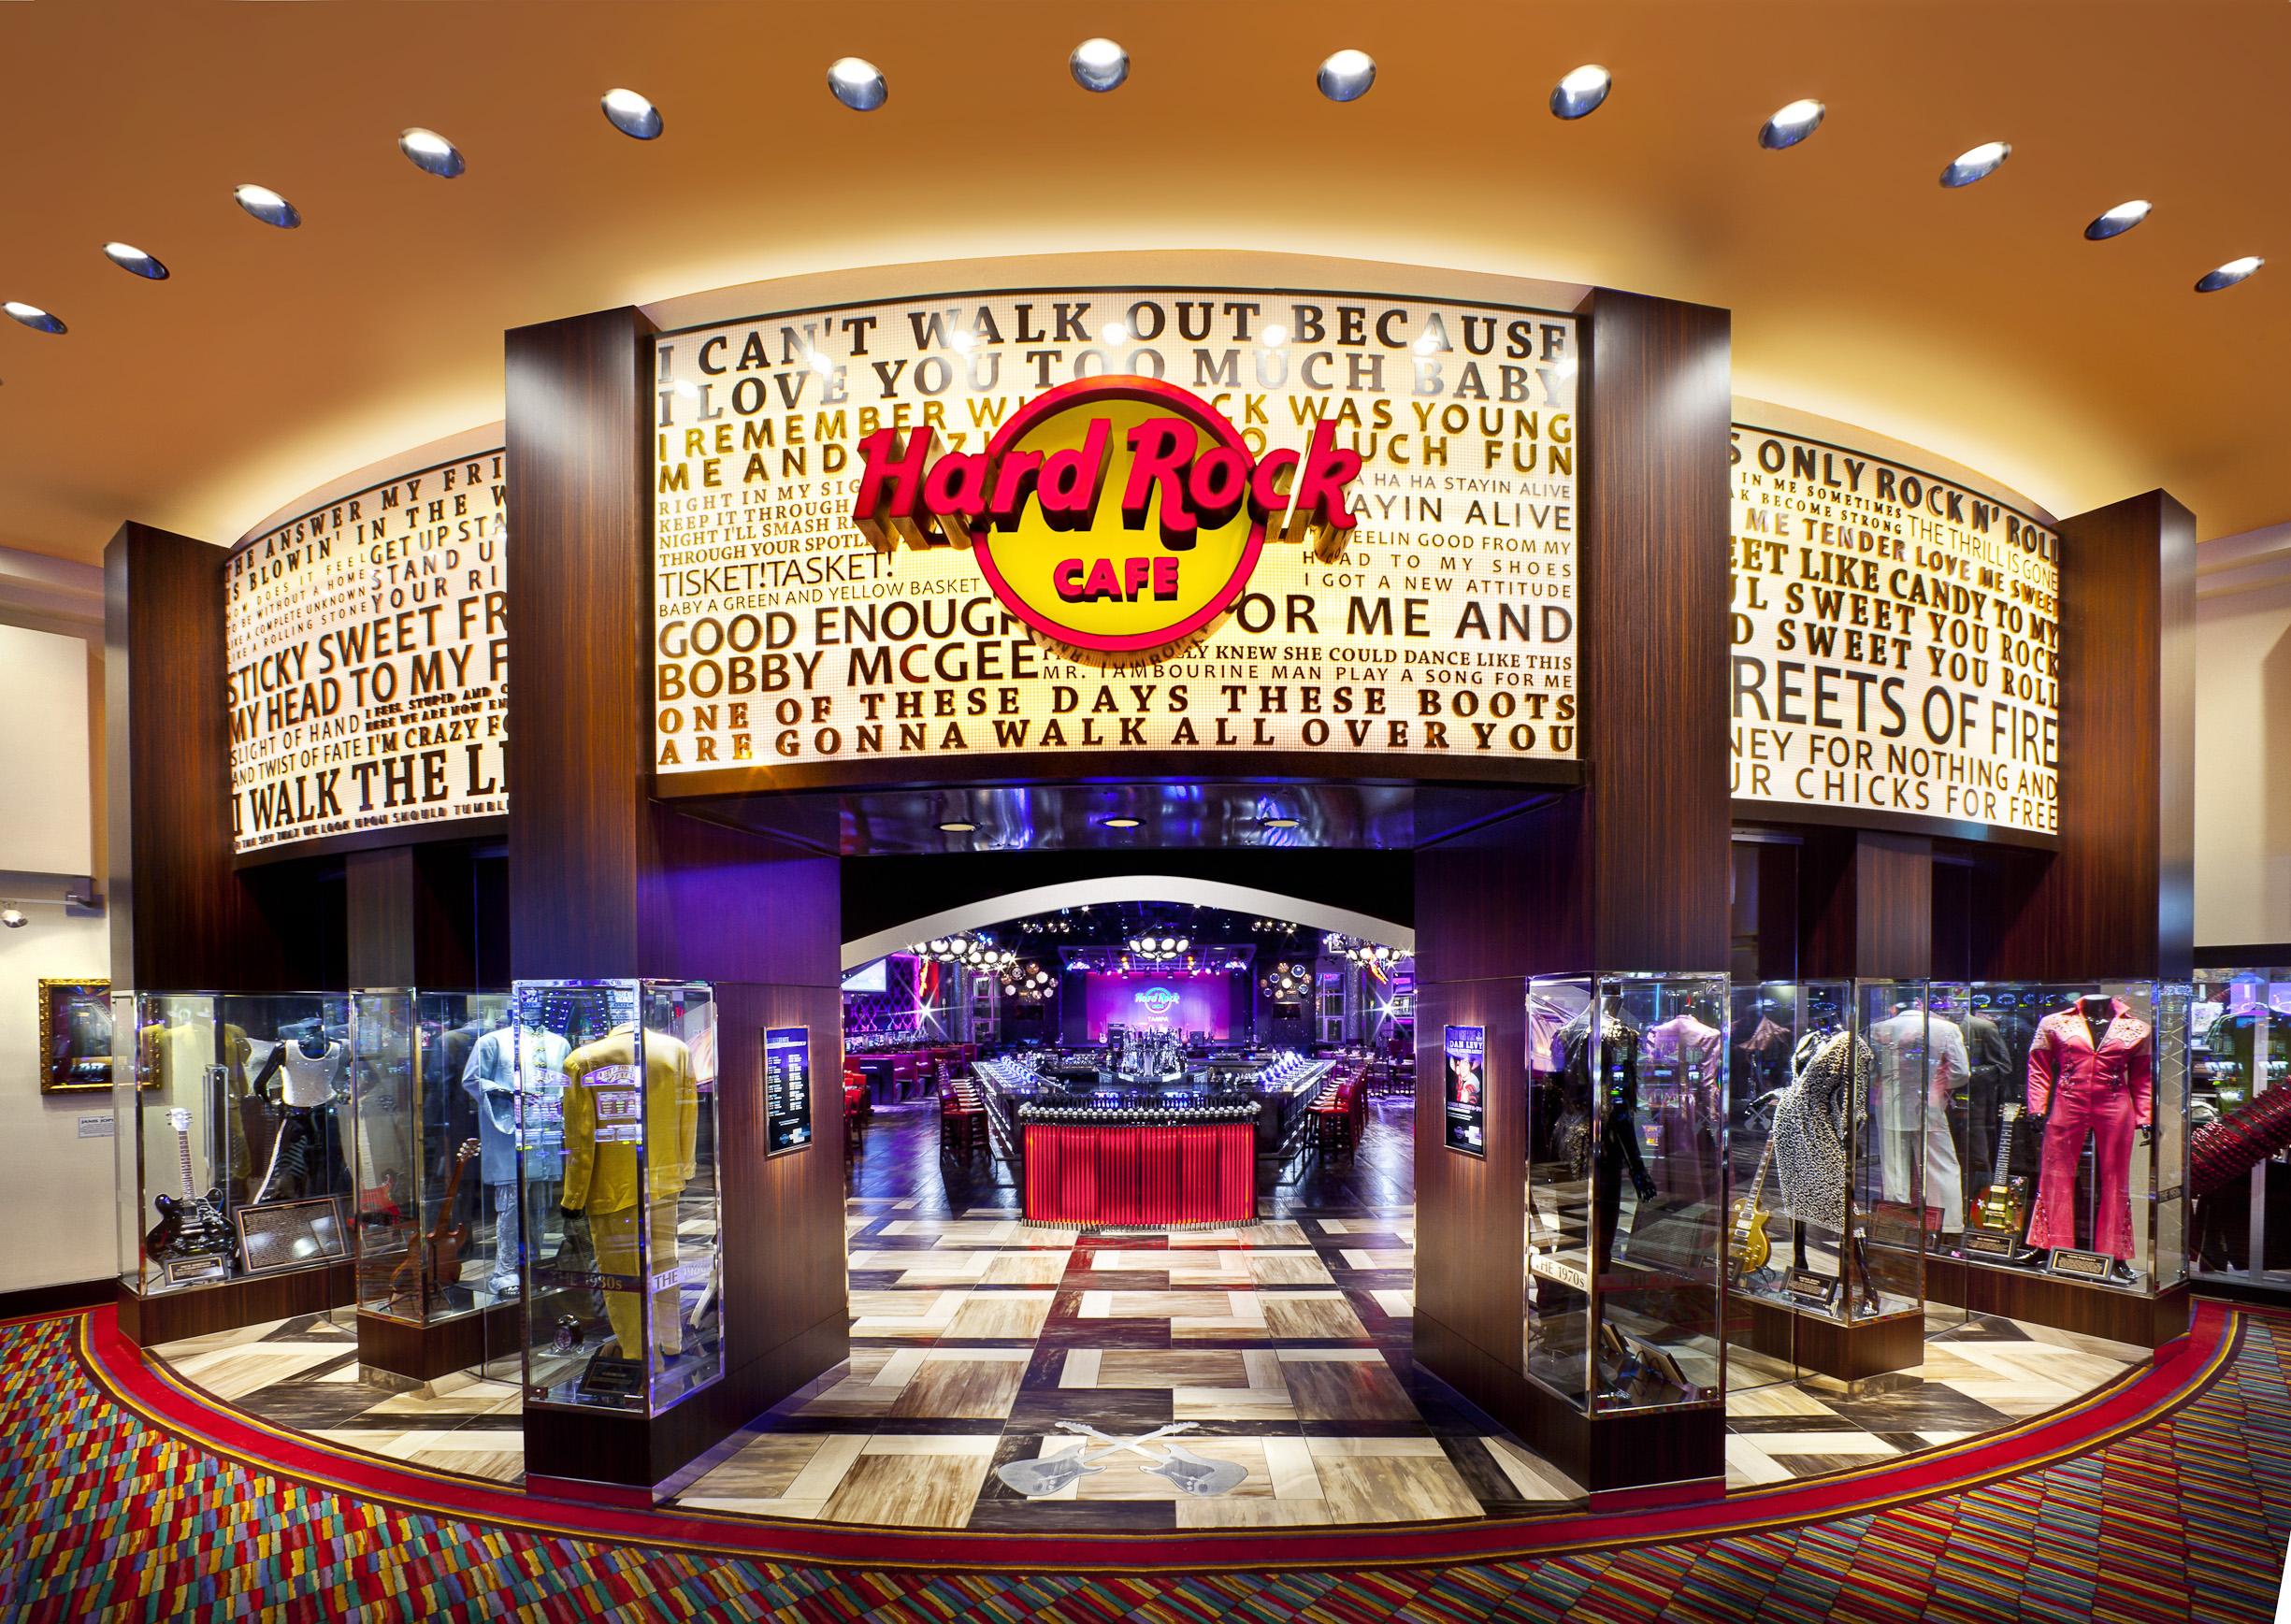 Hard Rock Casino Cafe Menu